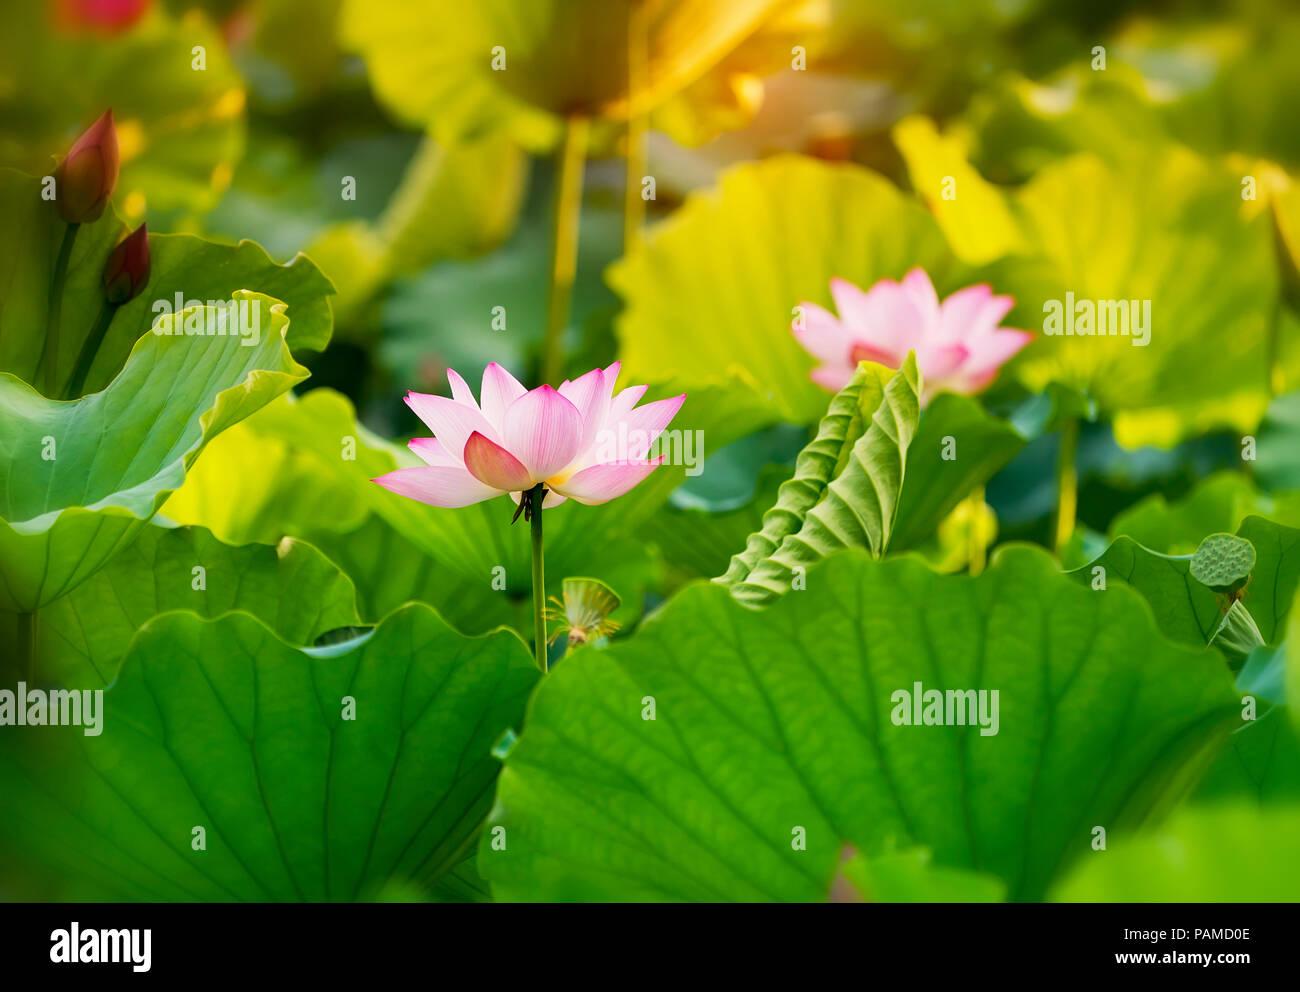 Blooming lotus flower stock photo 213120222 alamy blooming lotus flower izmirmasajfo